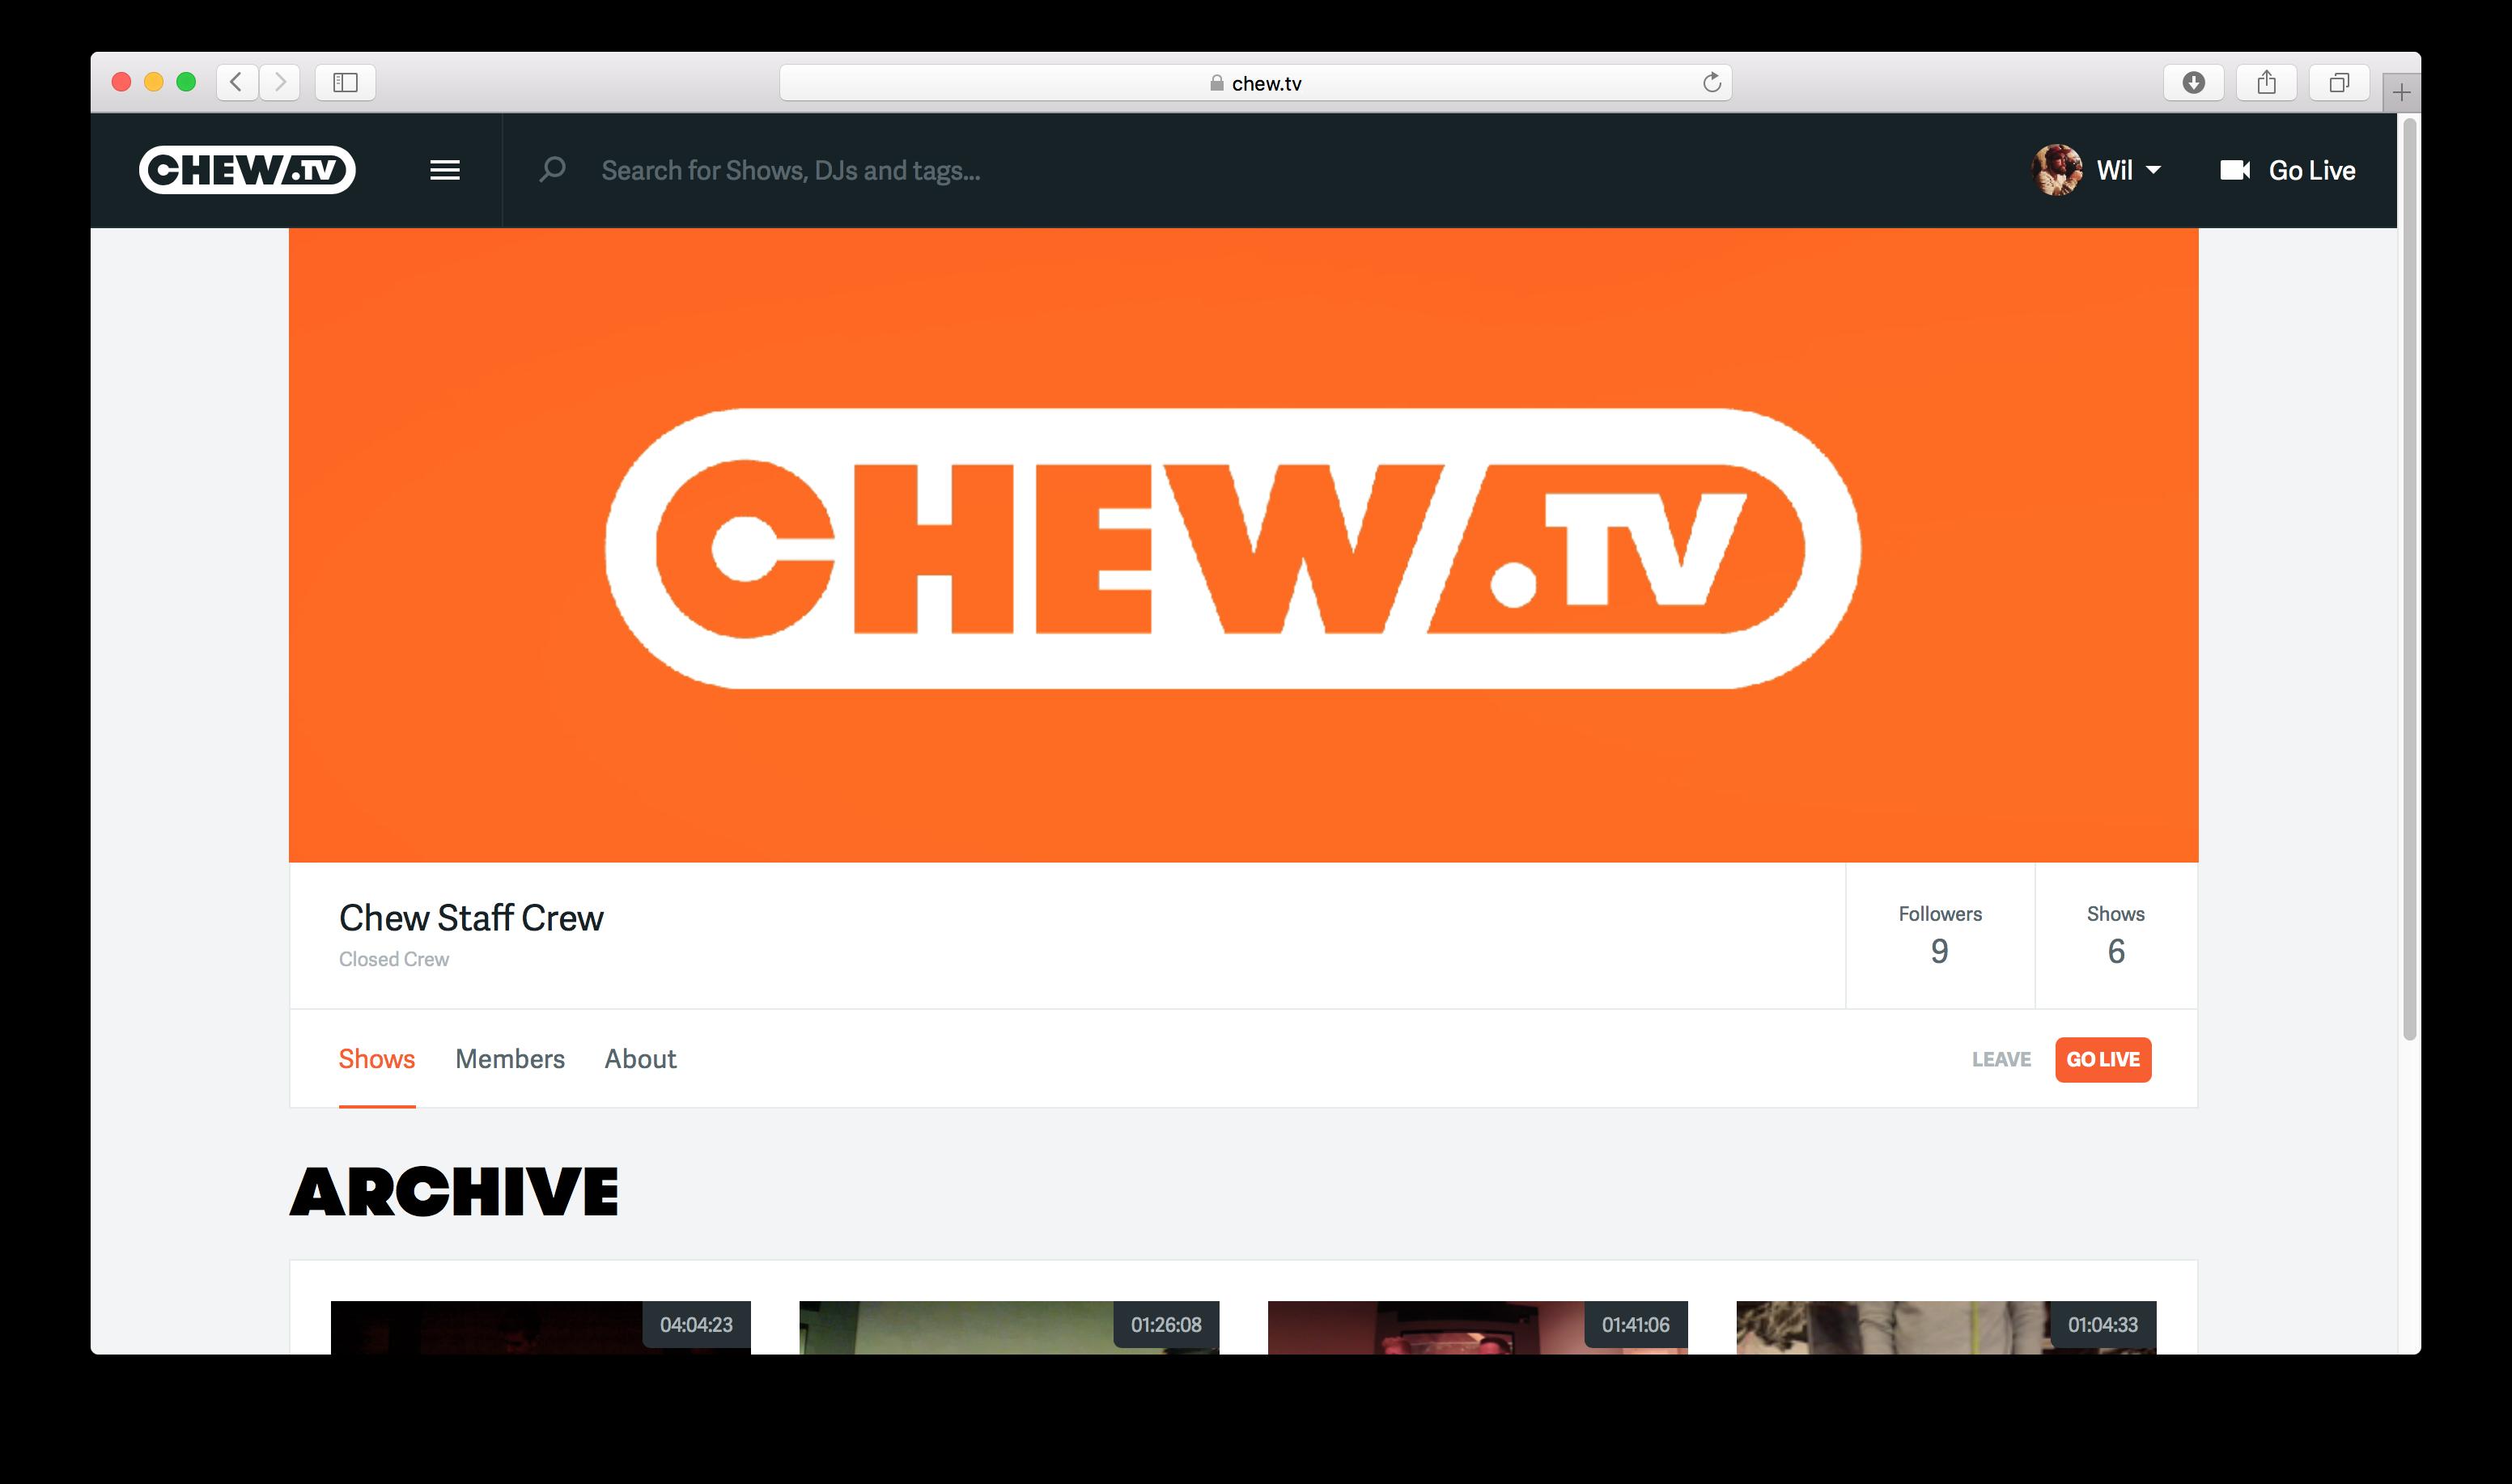 Chew Staff Crew